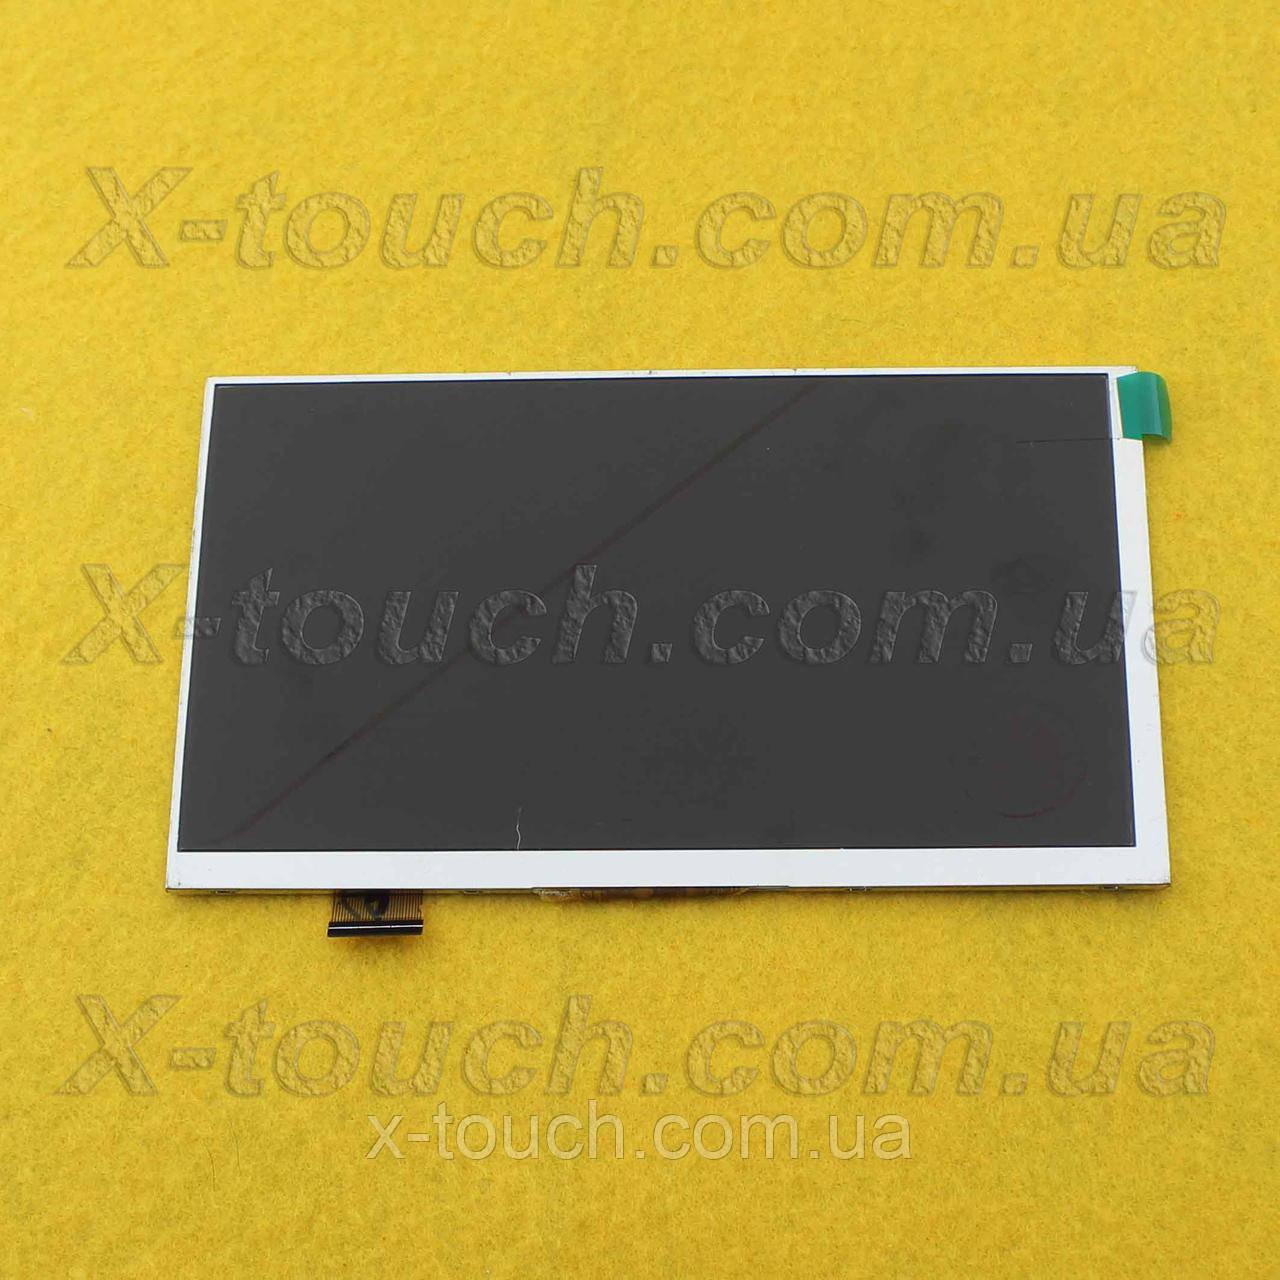 Матрица,экран, дисплей Impression ImPAD 6415 для планшета